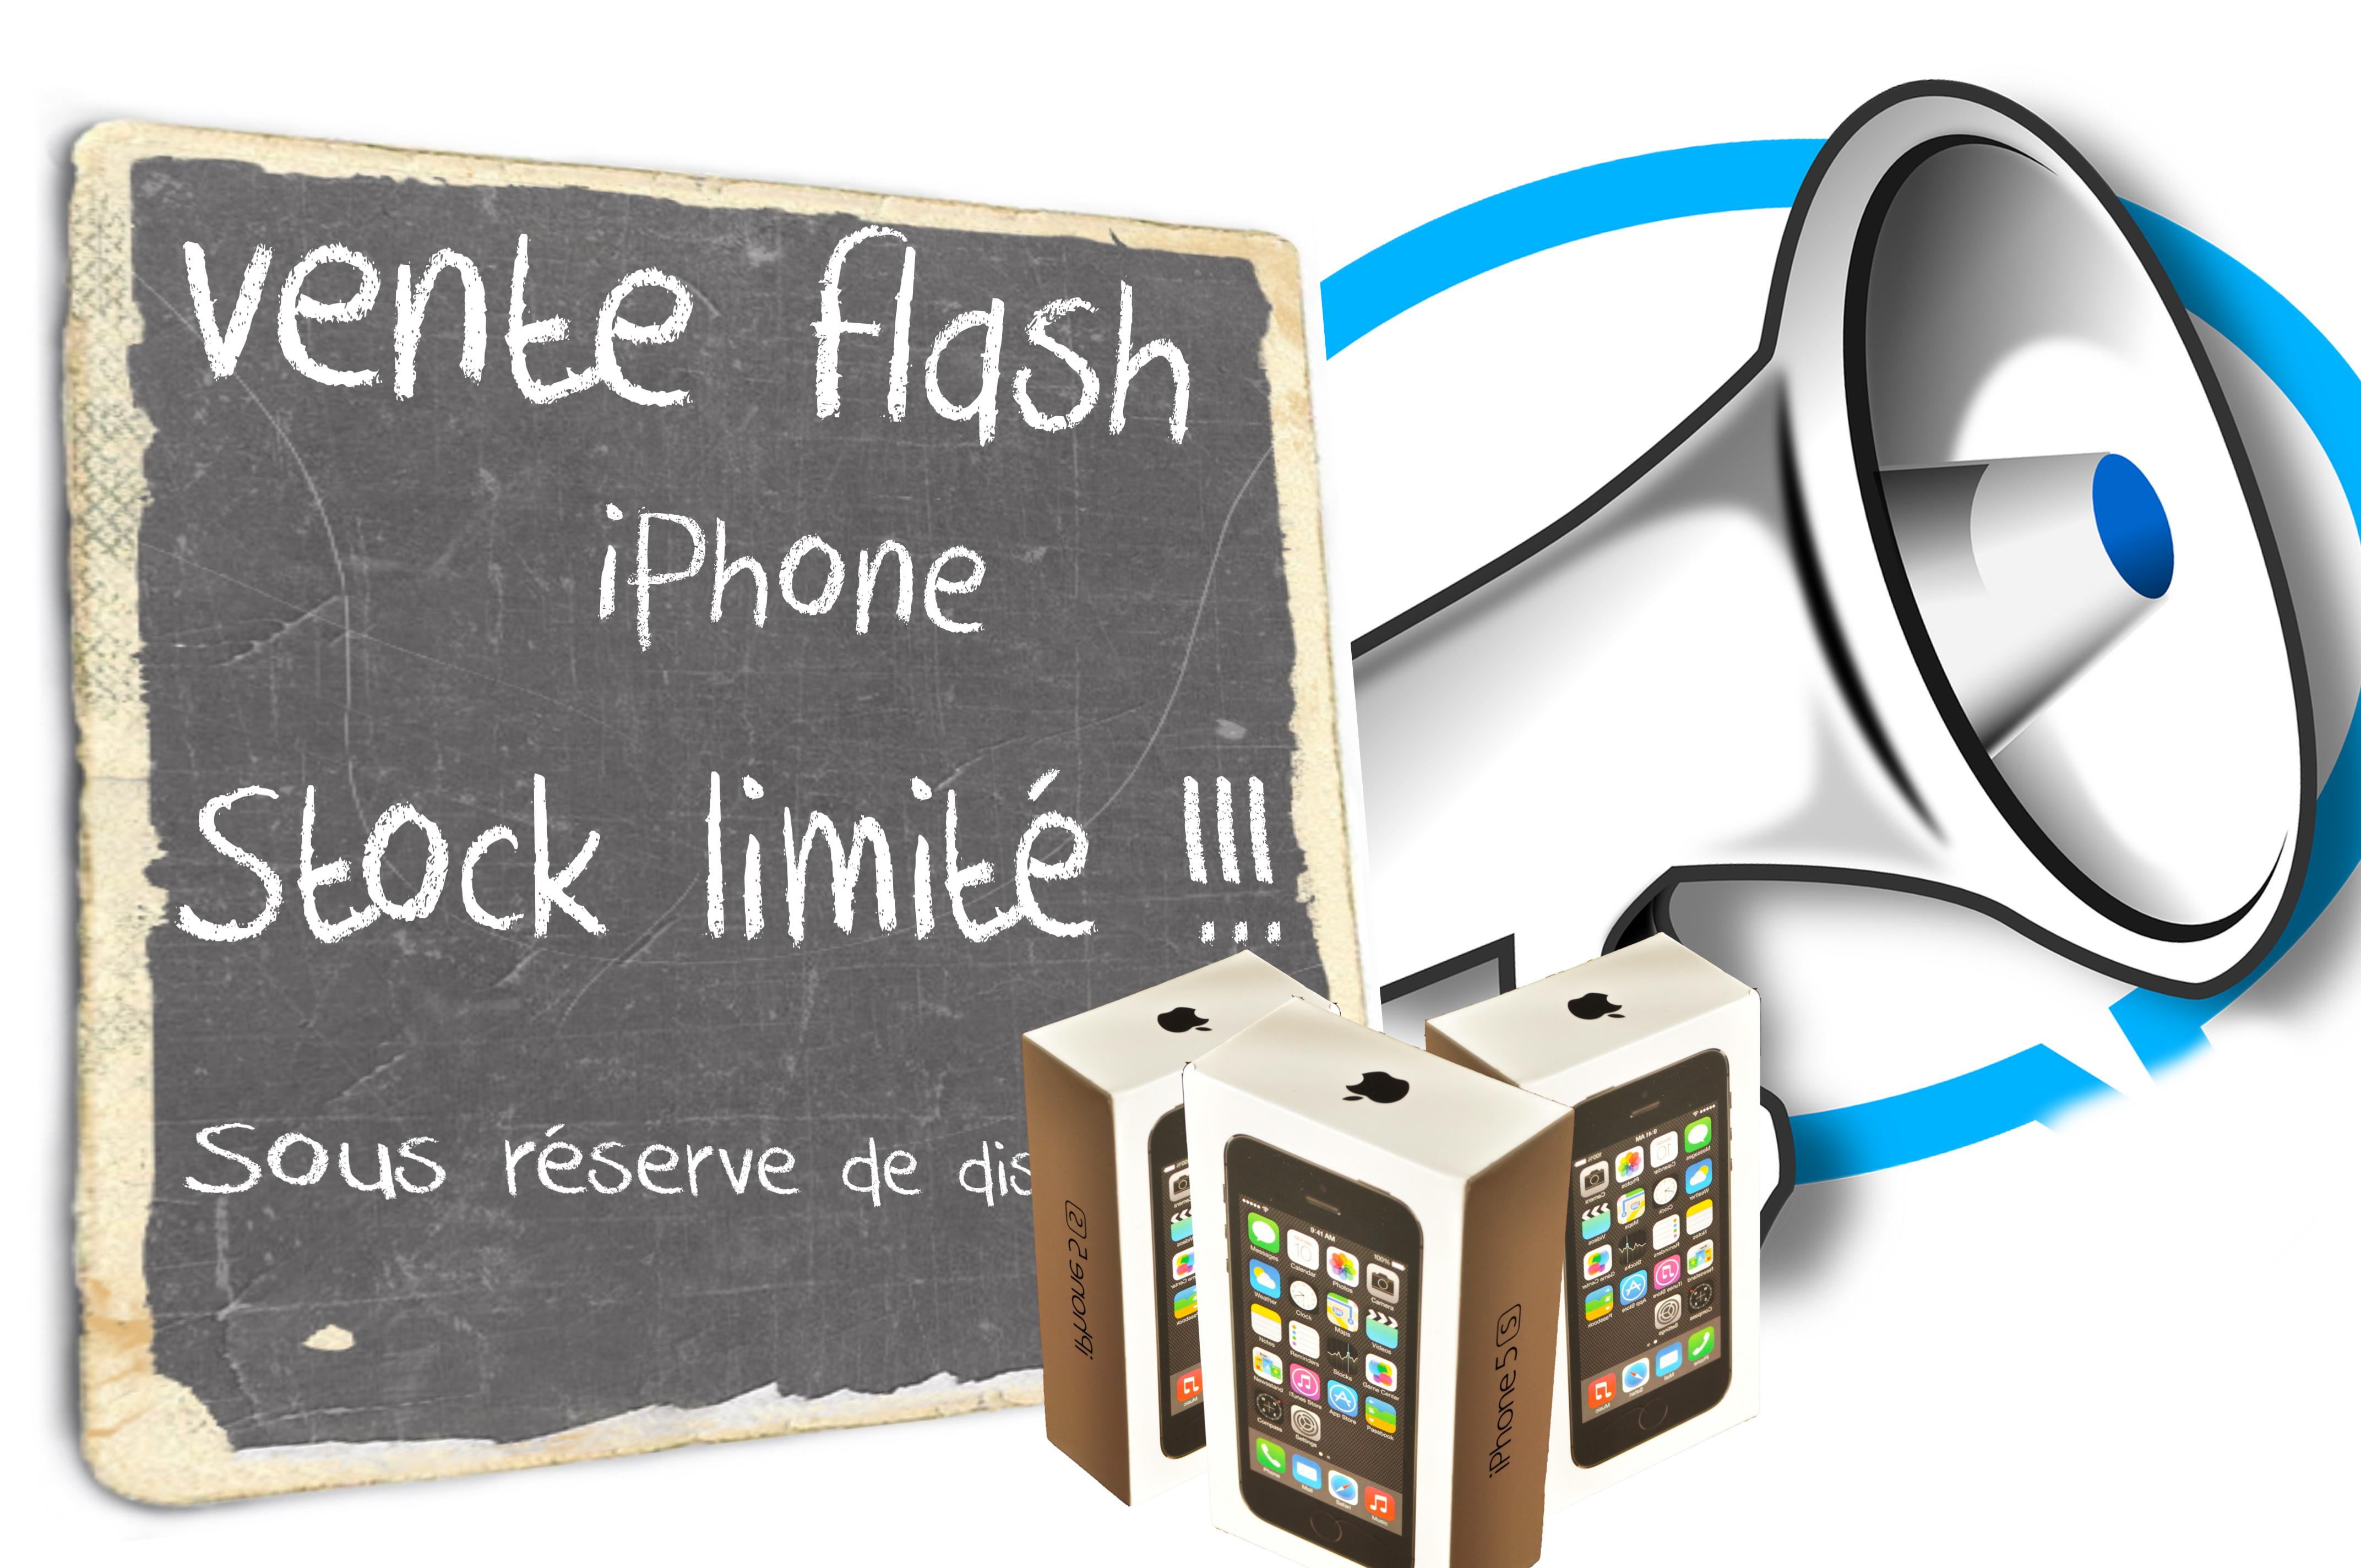 Vente flash smartphone 27 octobre 2015 clinic informatique - Vente flash internet ...